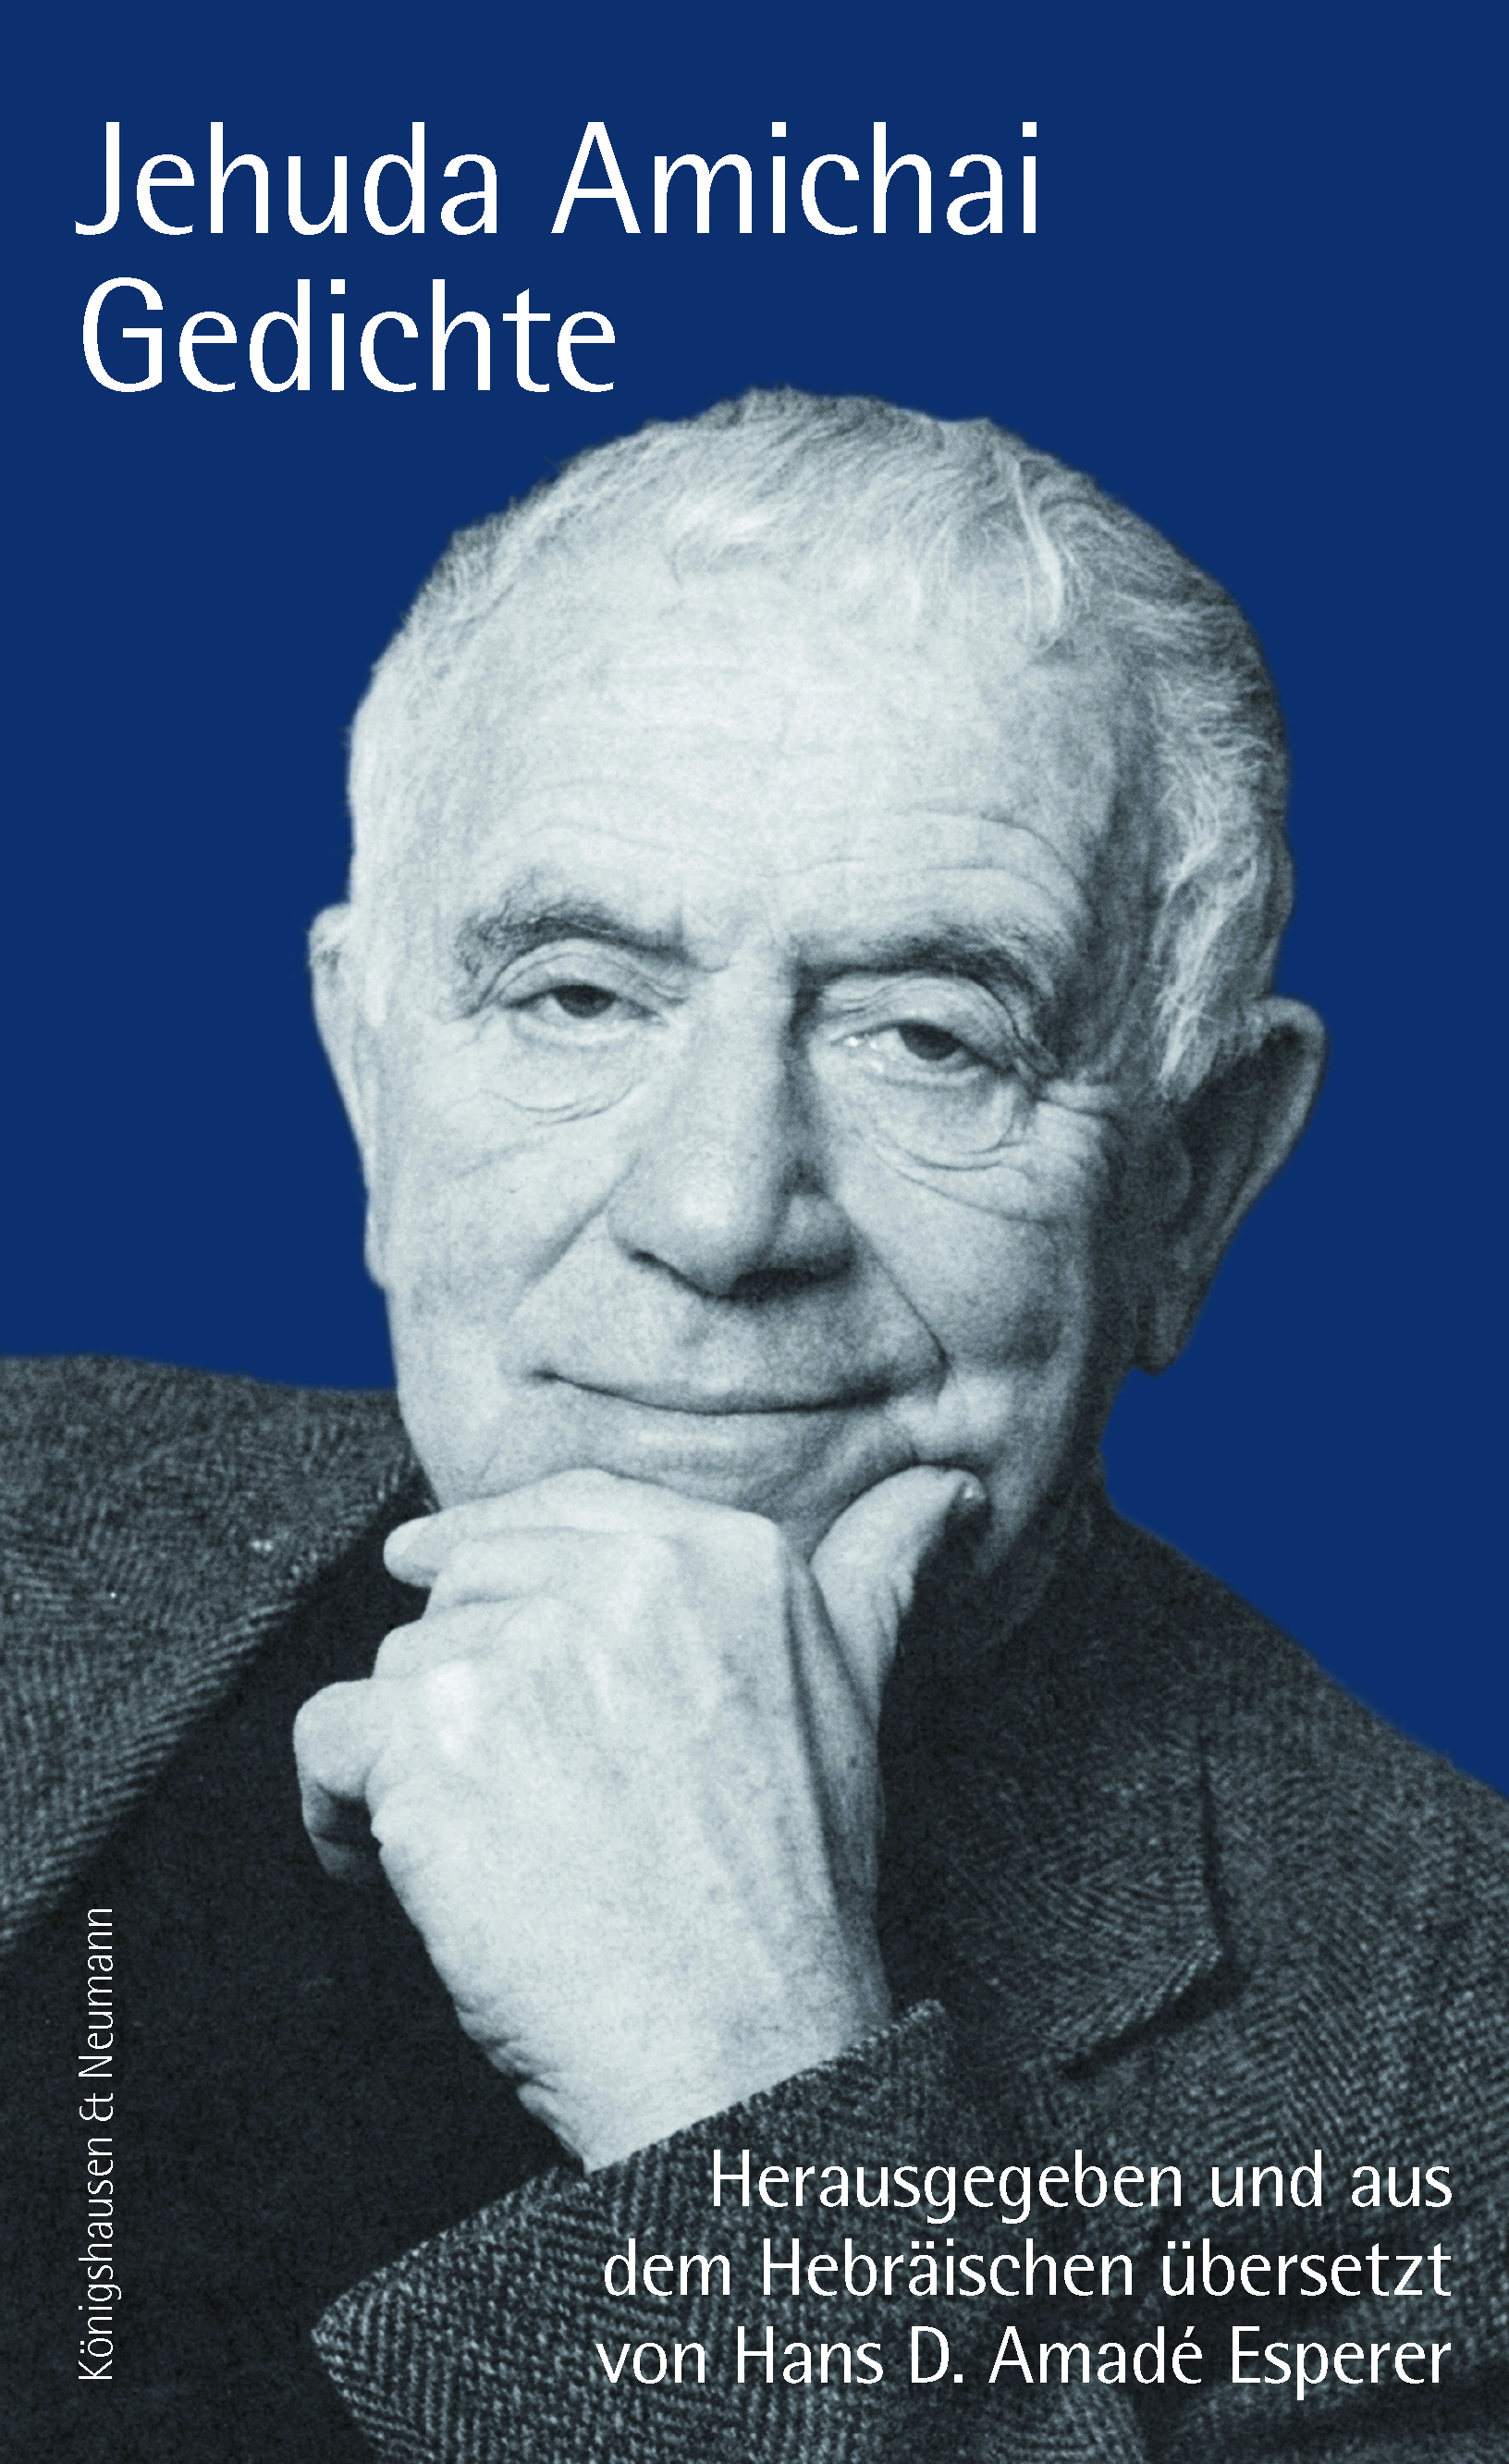 Jehuda Amichai. Foto: K & N Verlag